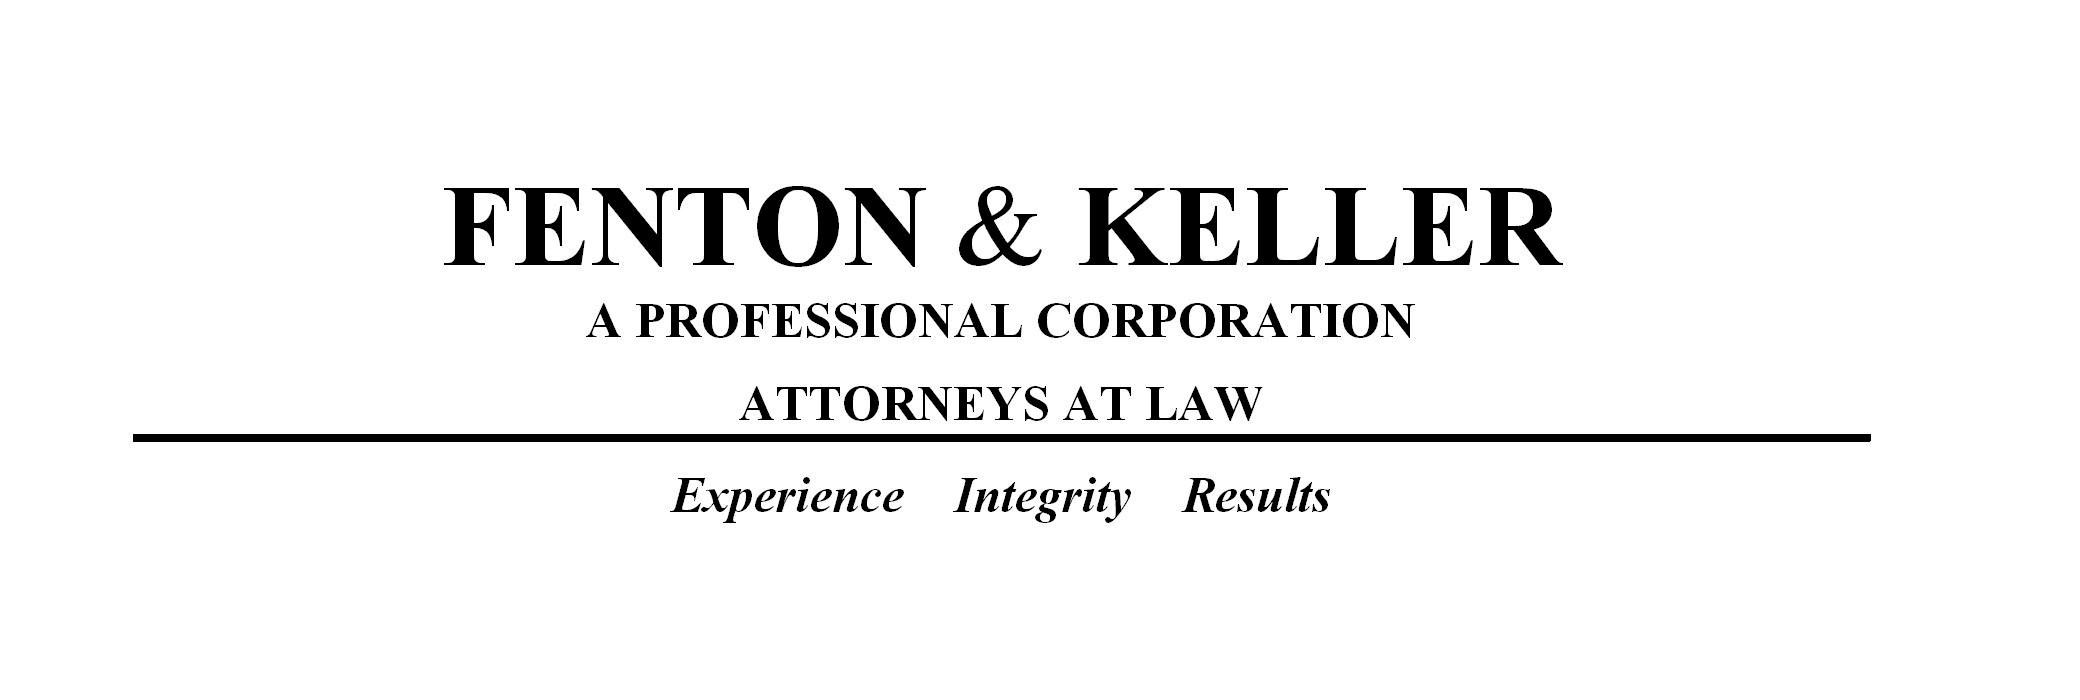 Fenton Keller logo